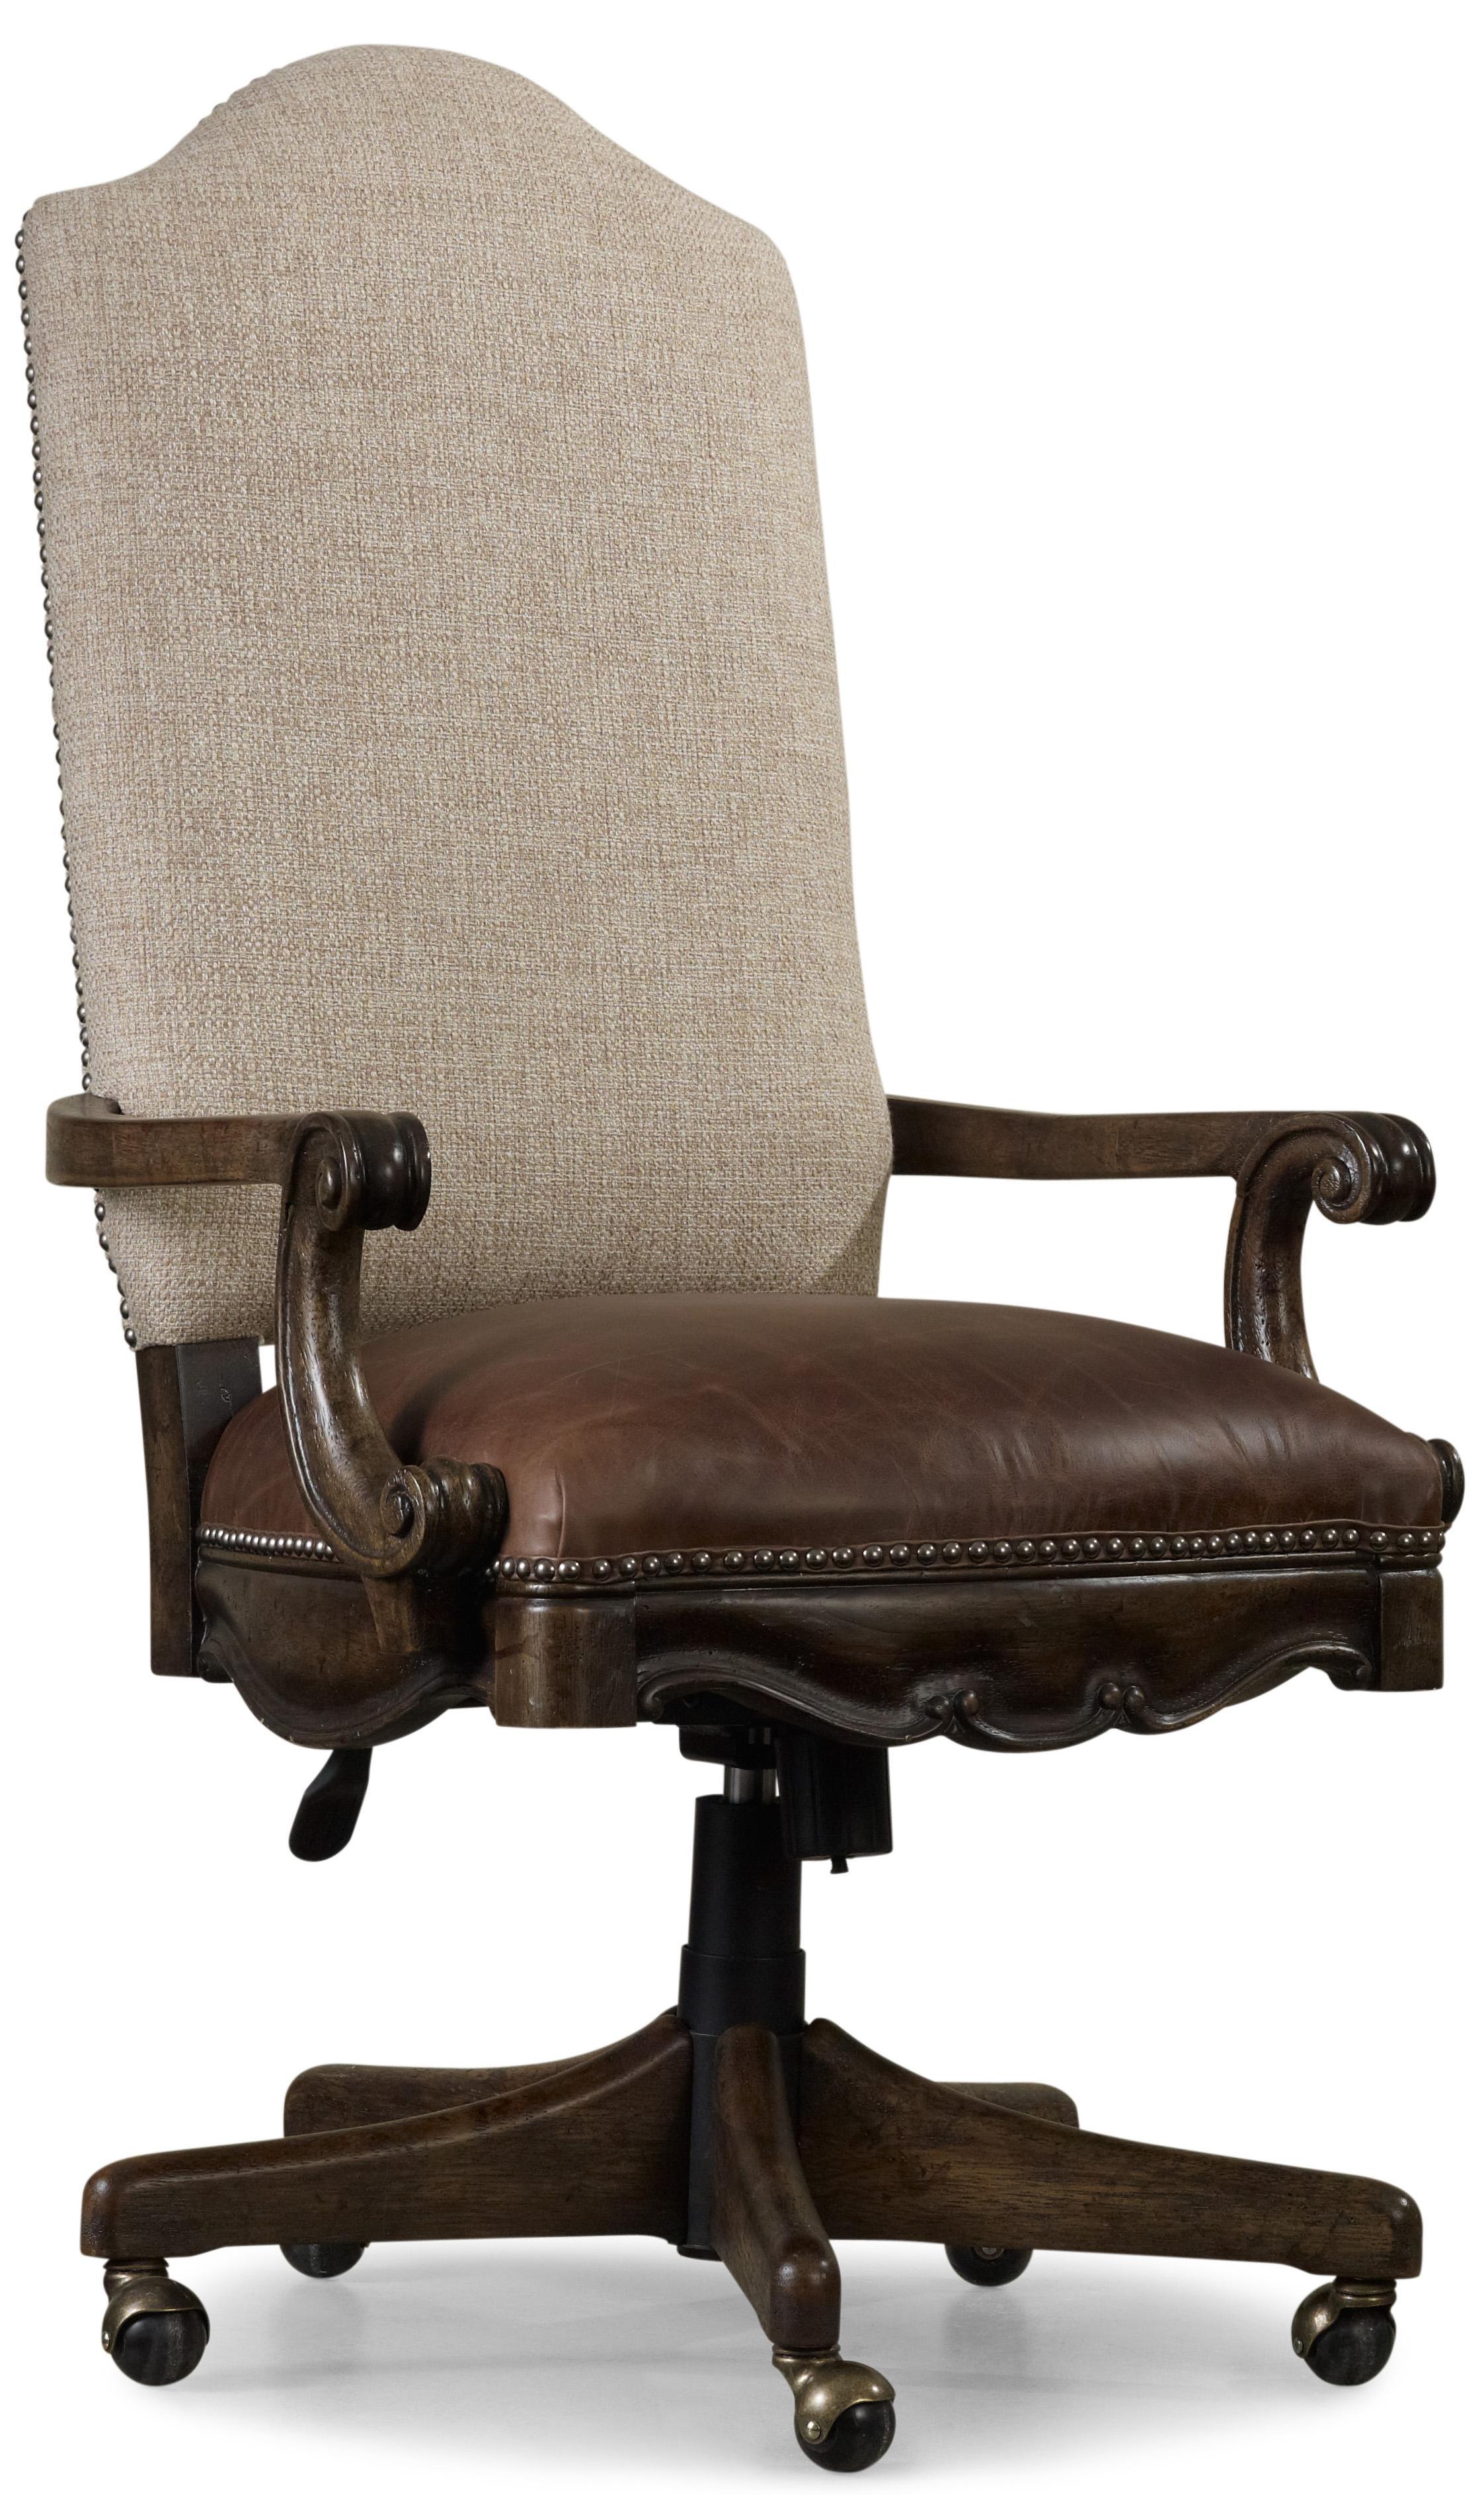 hooker leather chair mid century office furniture rhapsody tilt swivel with